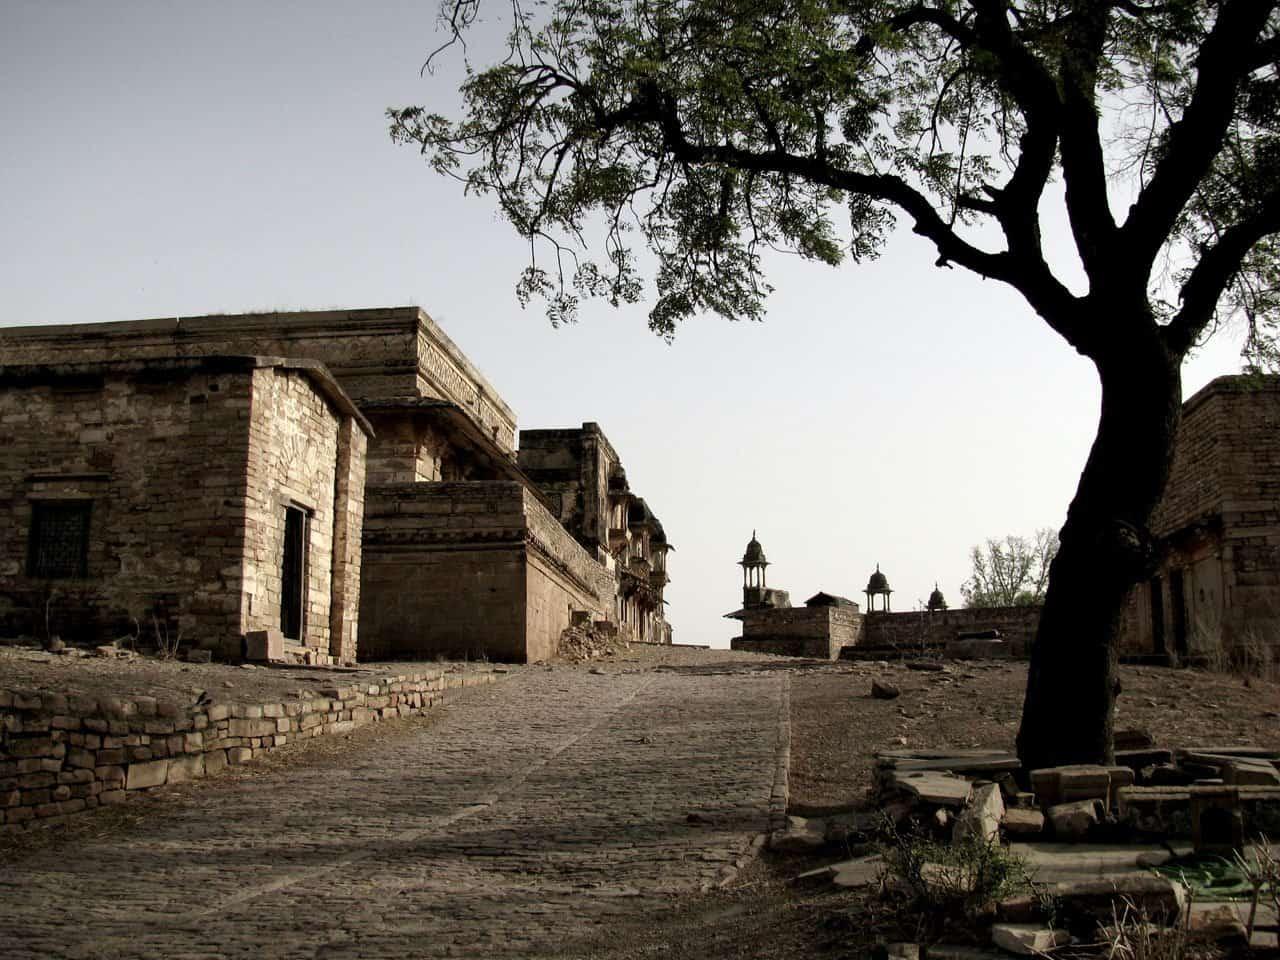 Walking tour in Gwalior